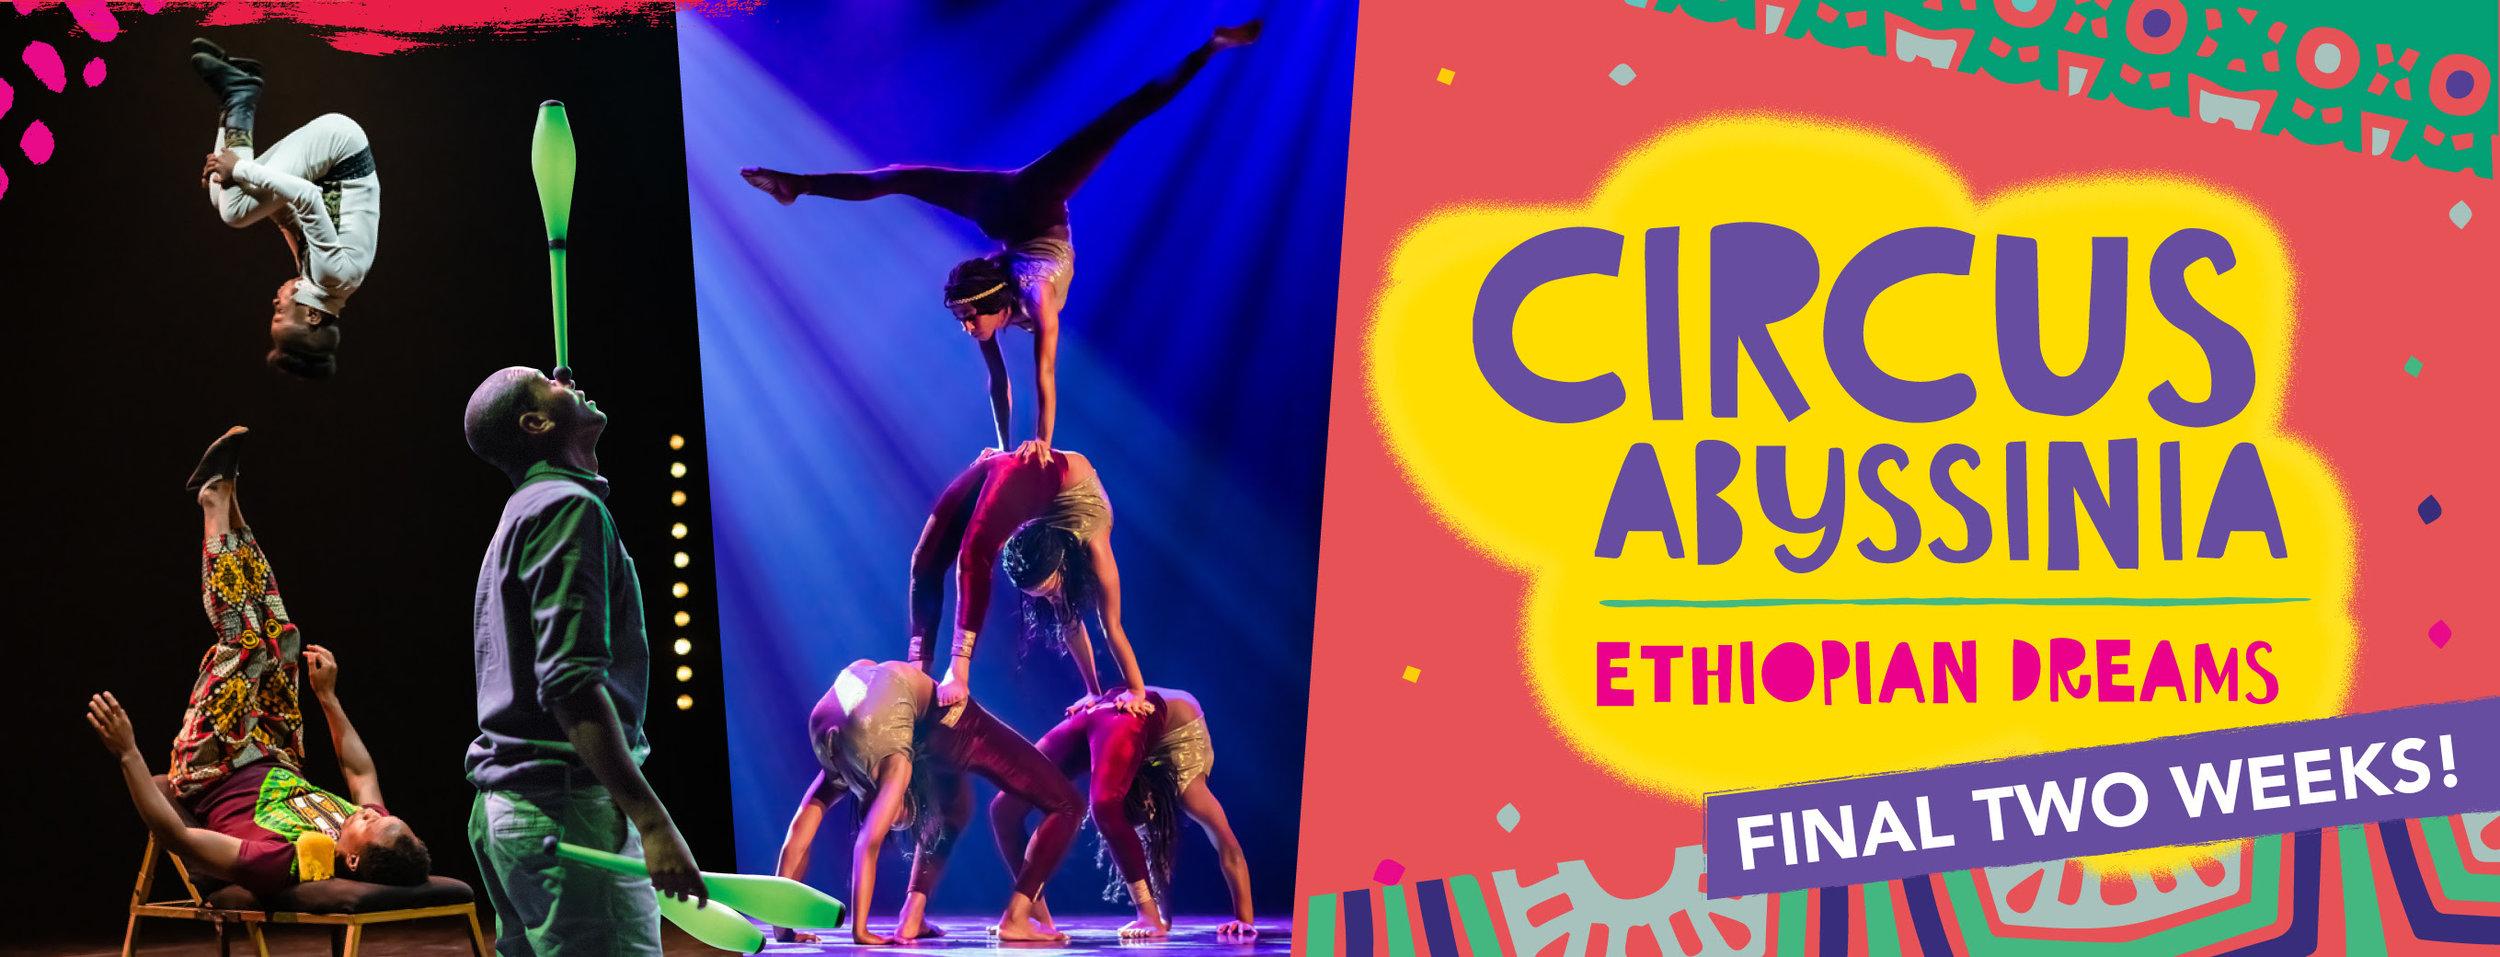 circus-abysnthia.jpg